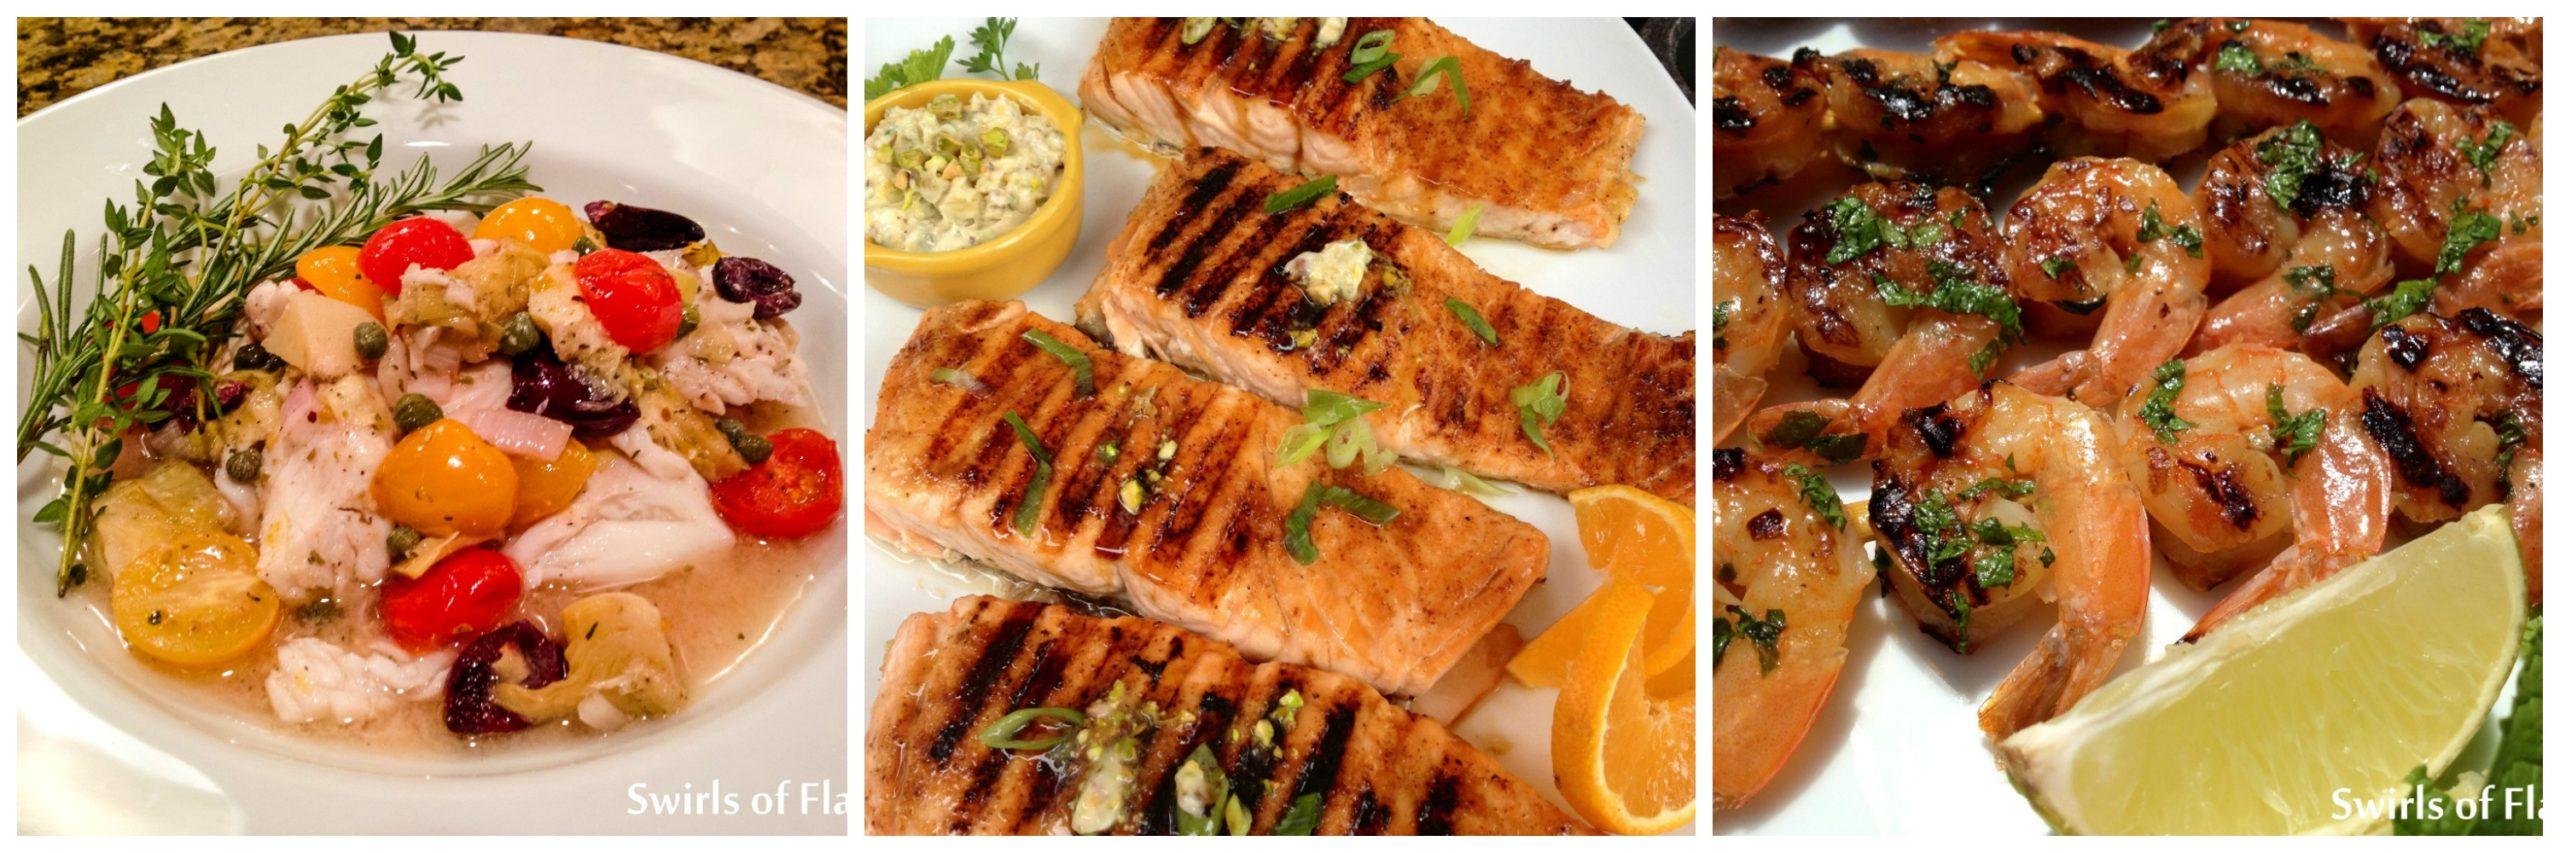 Tilapia Provencale, Pistachio Salmon and Mojito Salmon